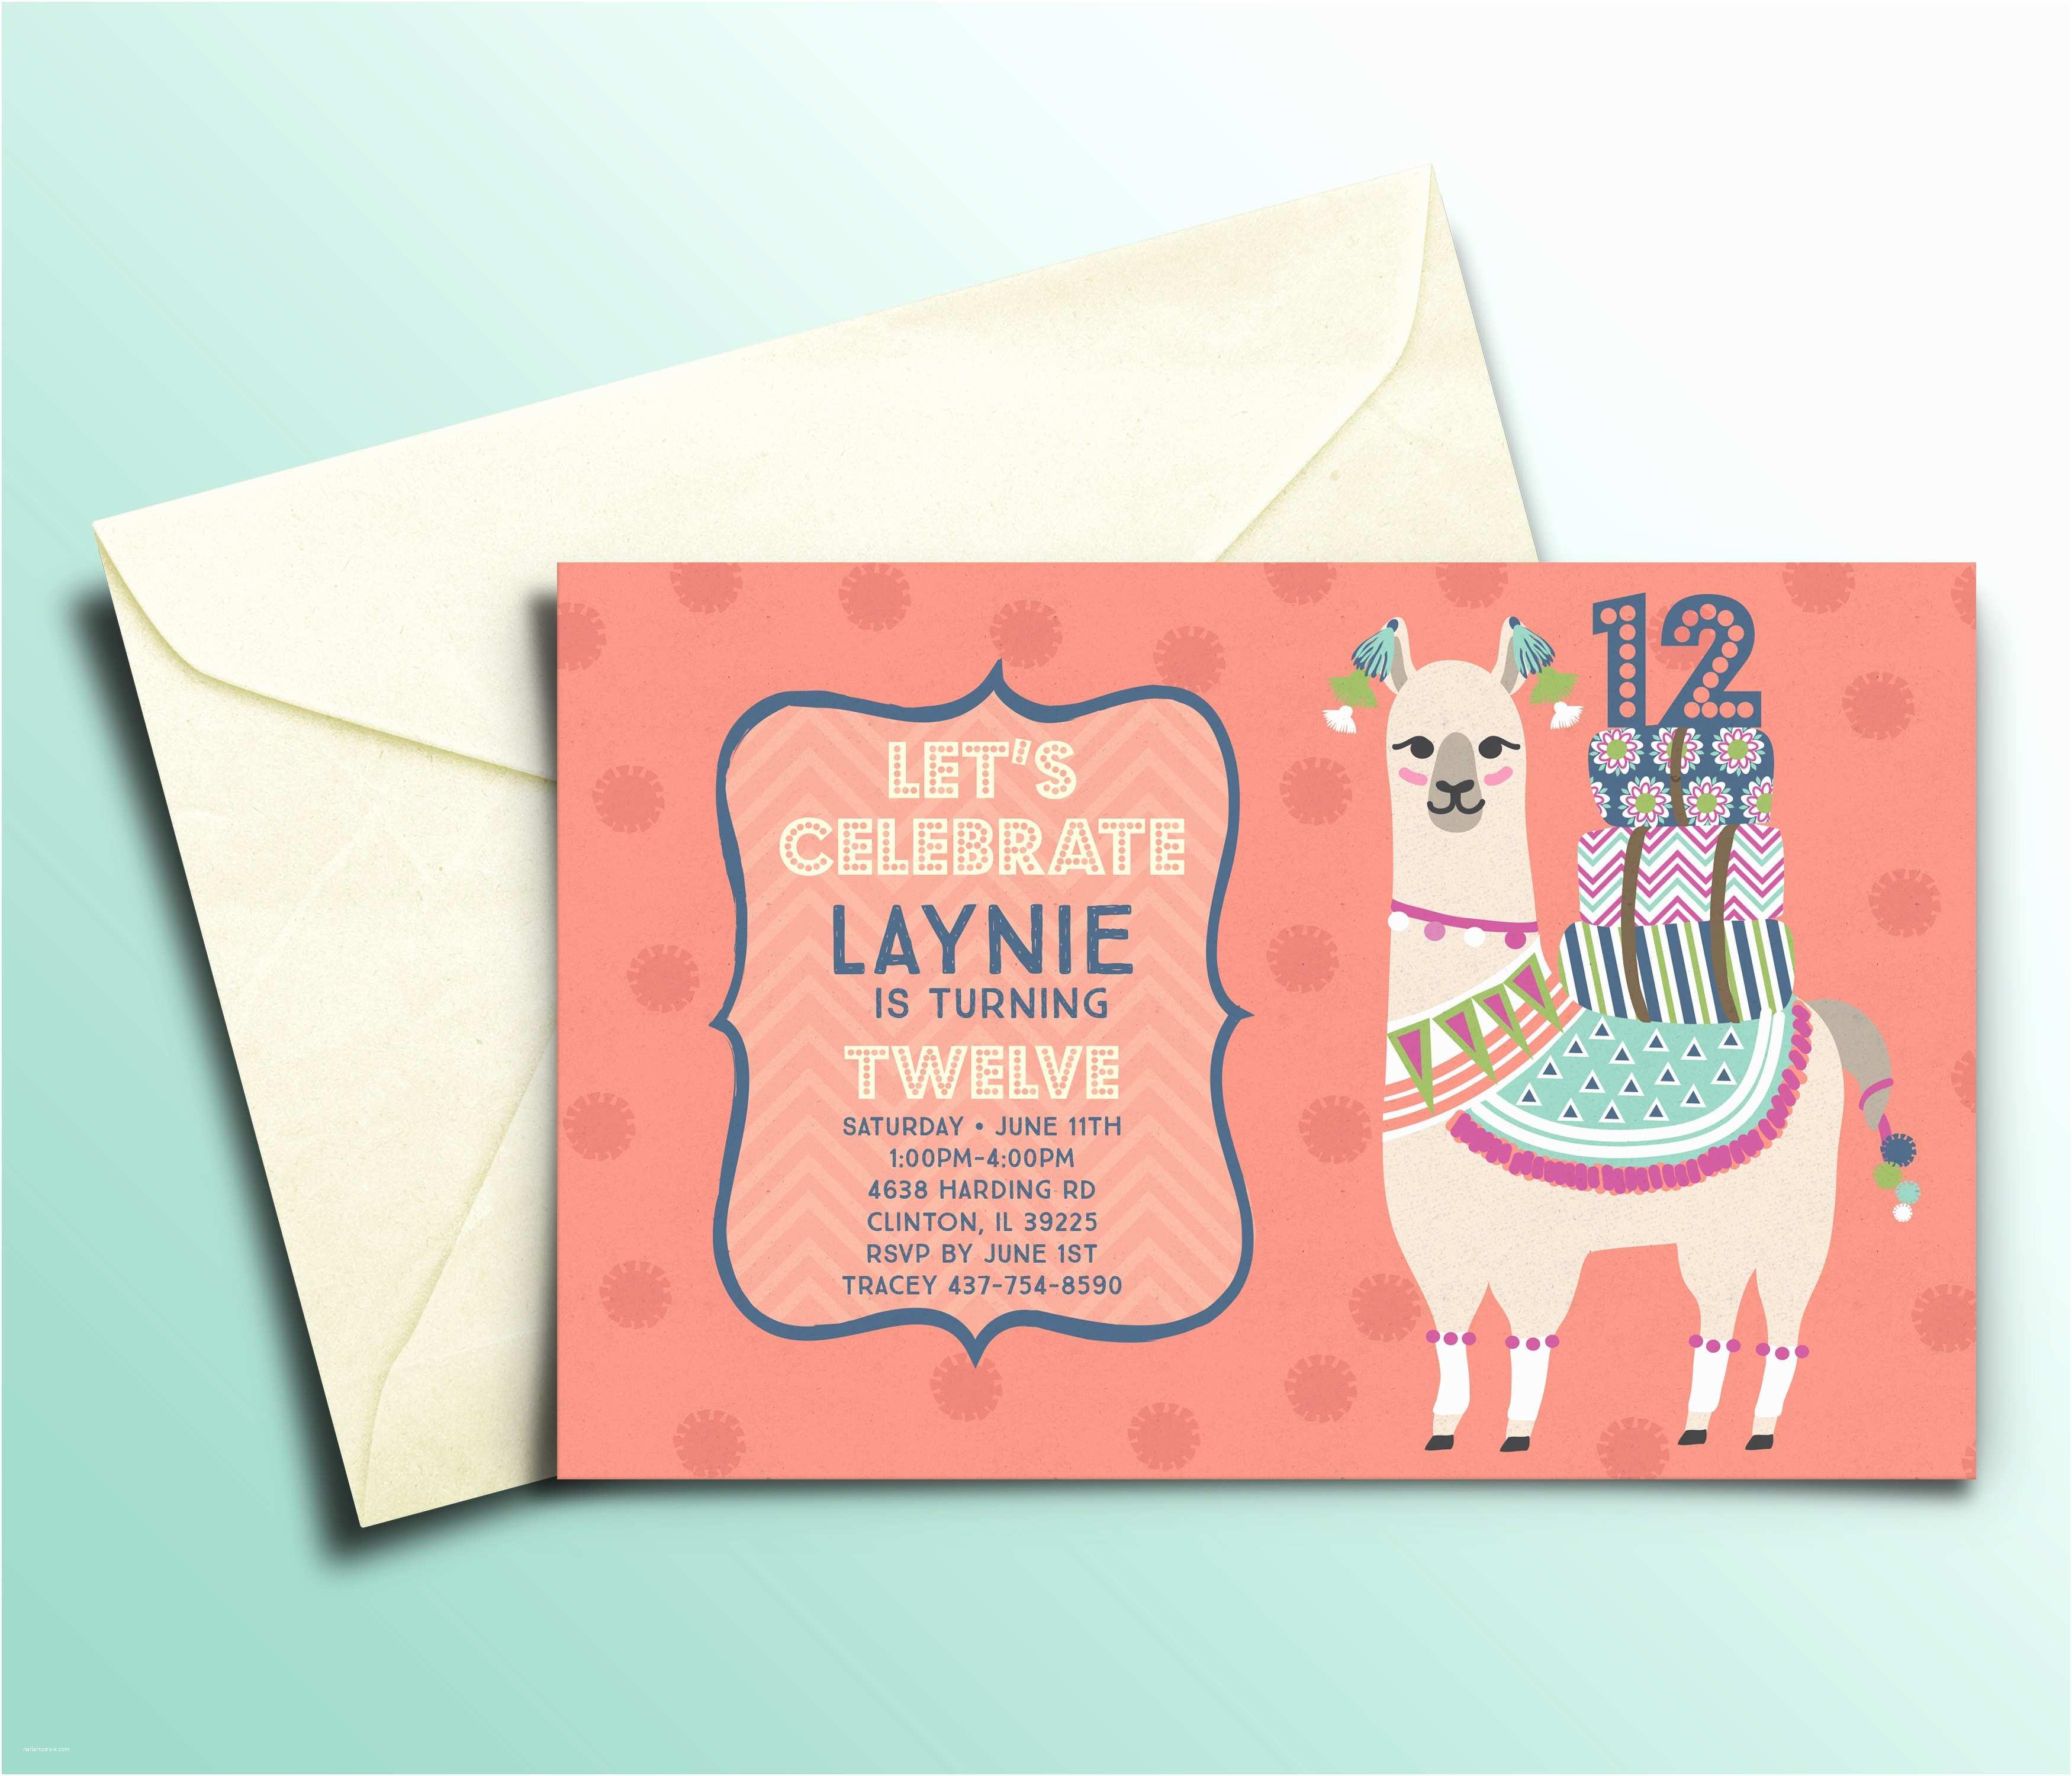 Personalized Birthday Invitations Llama Personalized Kids Birthday Party Invitations – Bella Bug